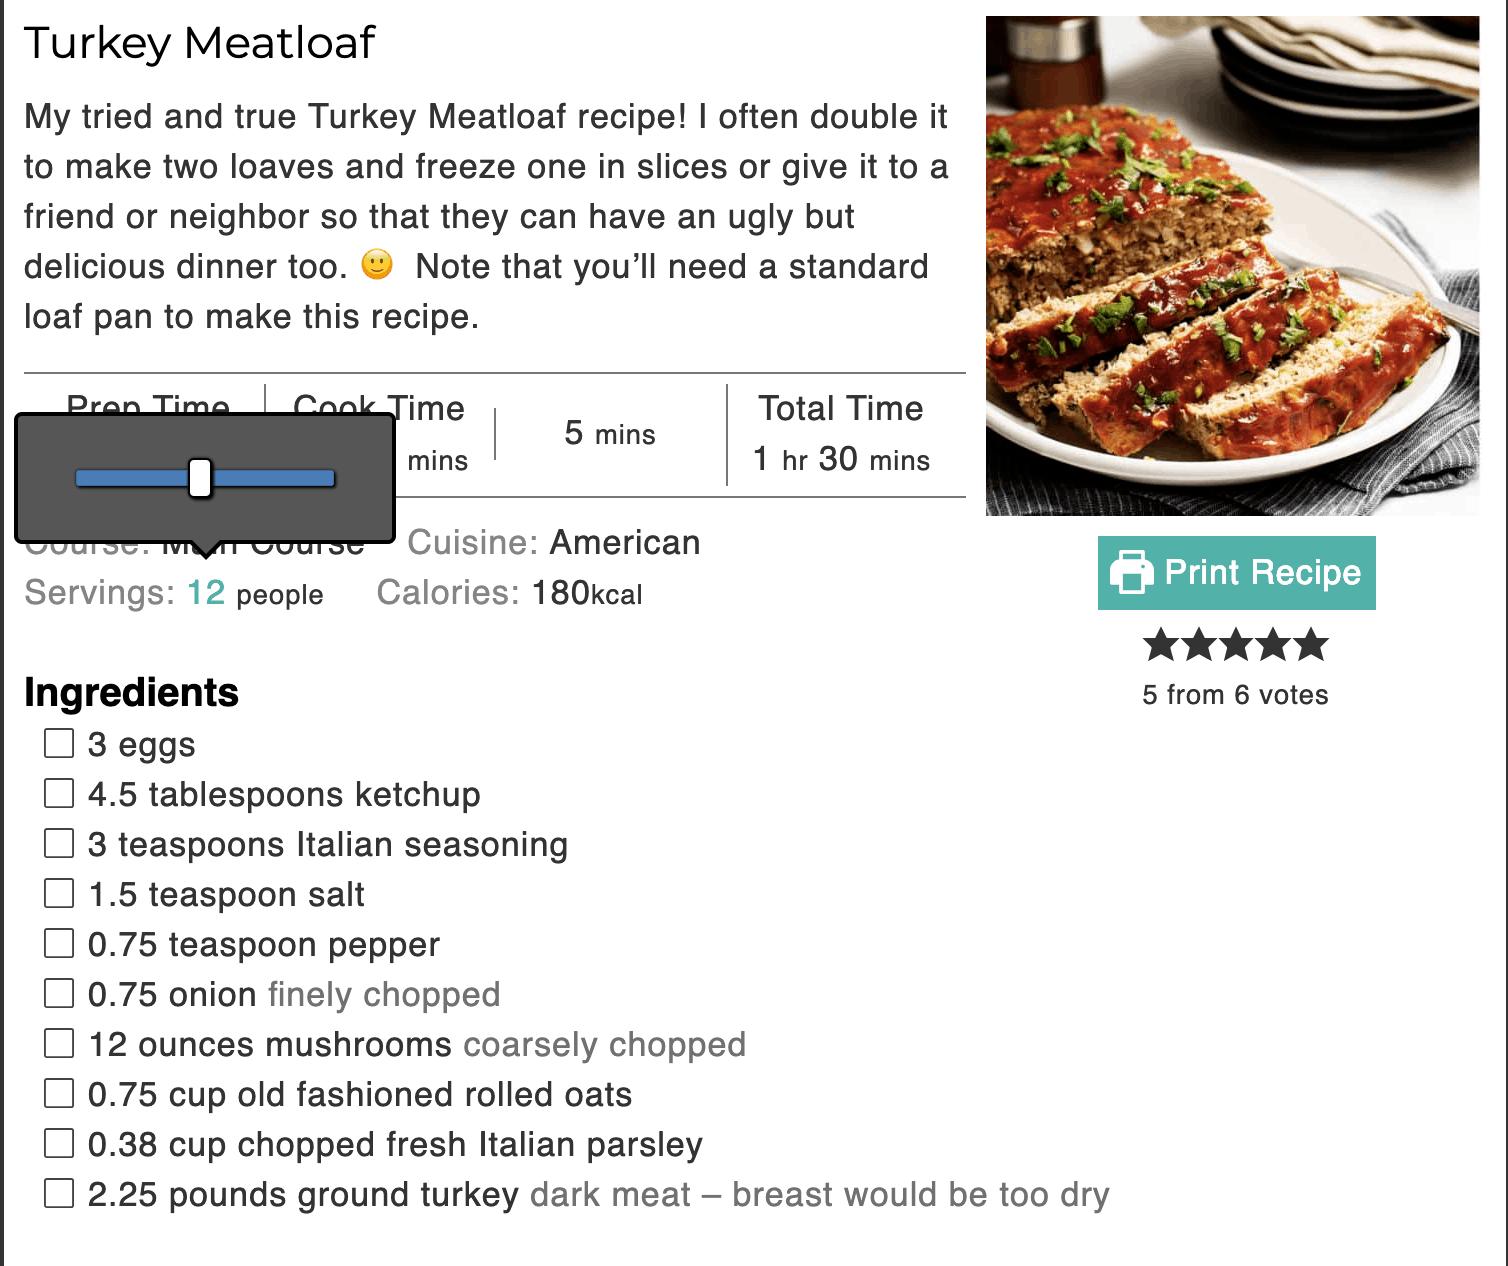 Turkey Meatloaf Ingredient Amounts For 2 1 Pound Loaf Pans Turkey Meatloaf Meatloaf Turkey Meatloaf Recipes